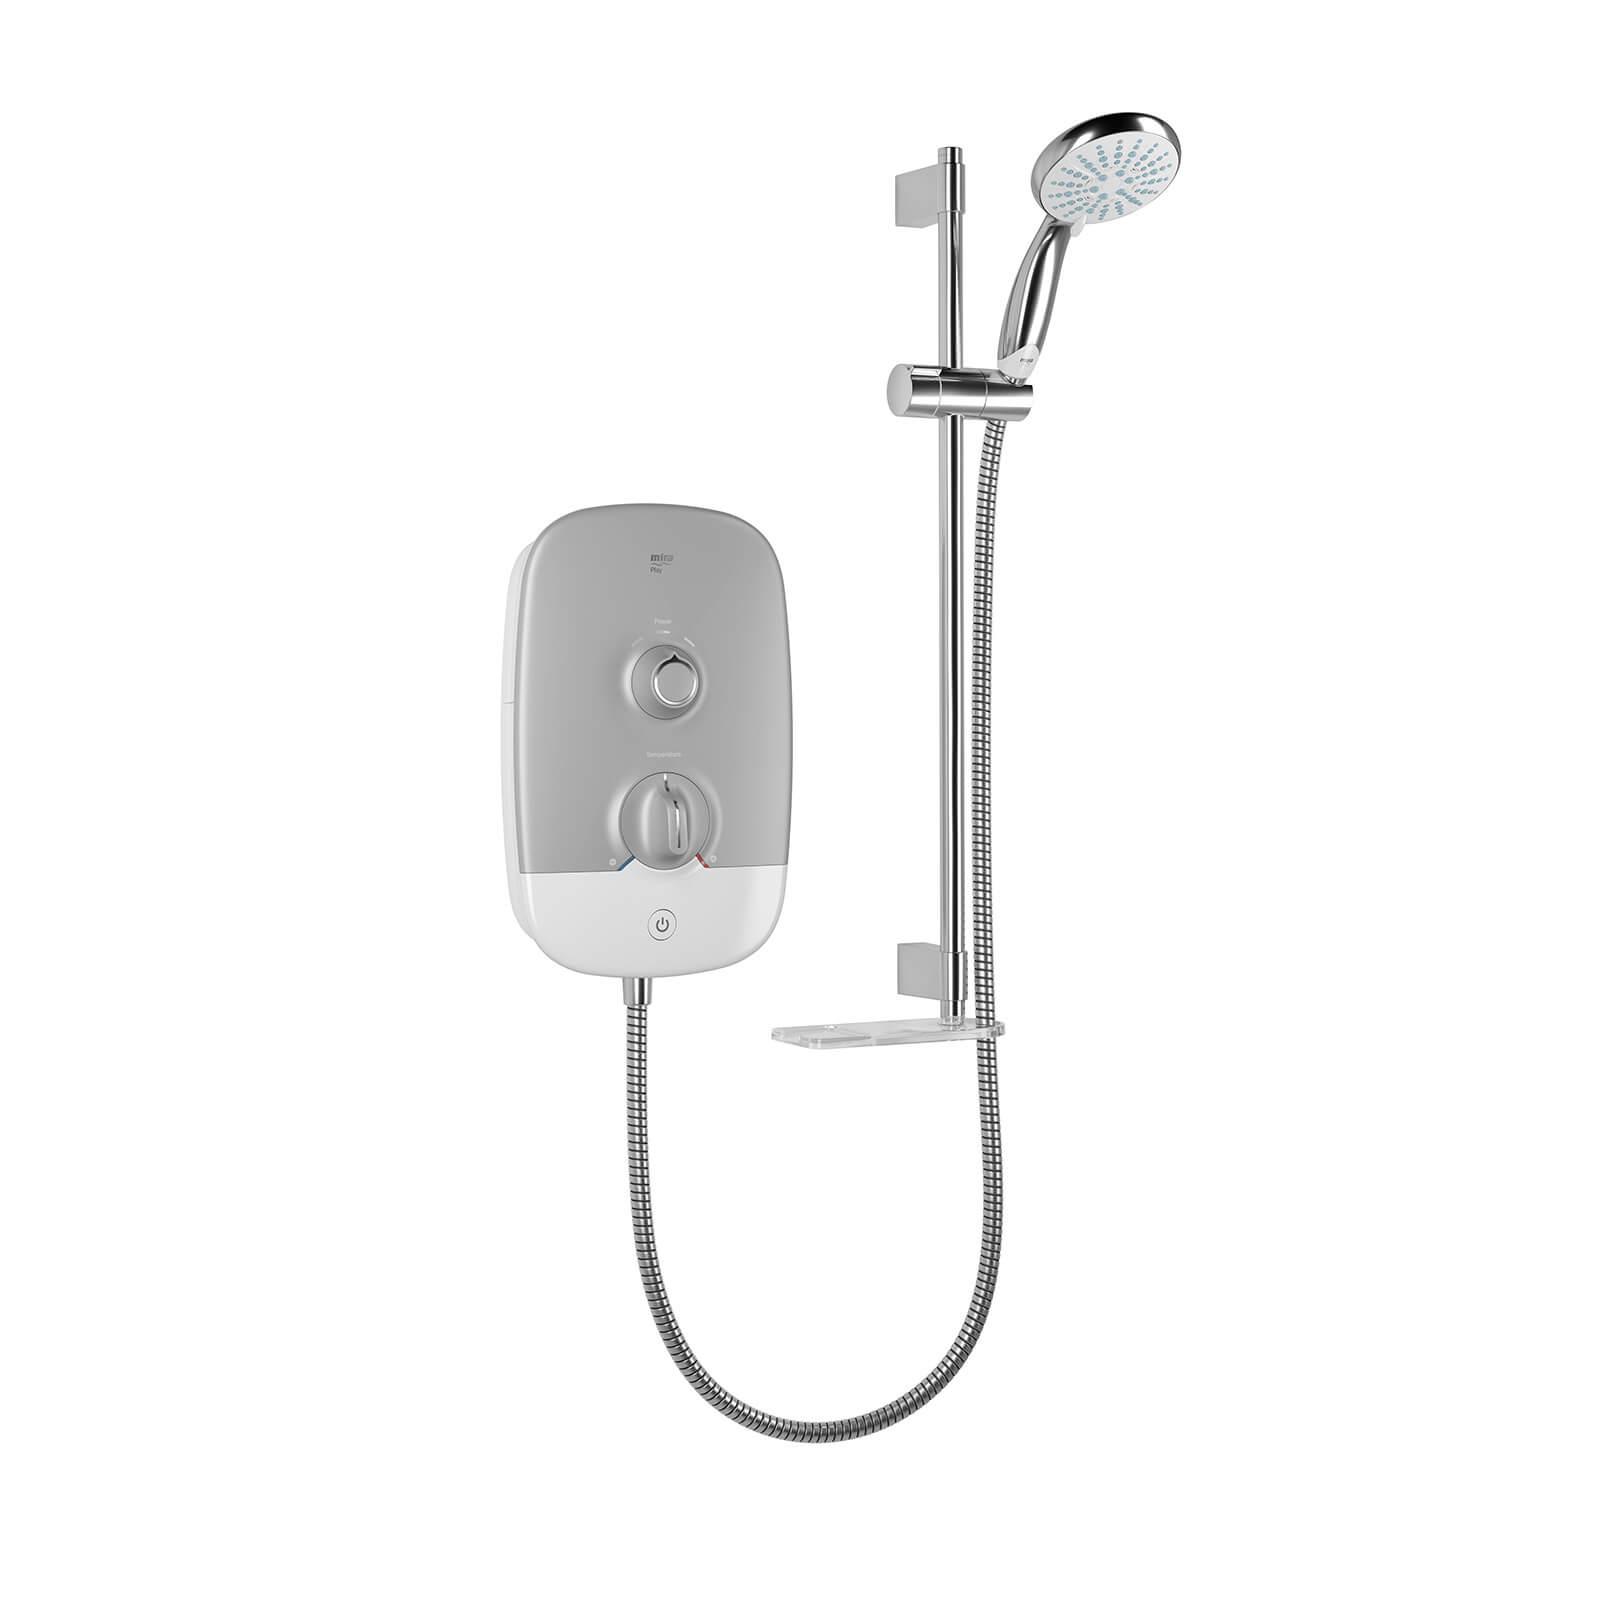 Mira Play 10.8kW Electric Shower - Satin/Chrome